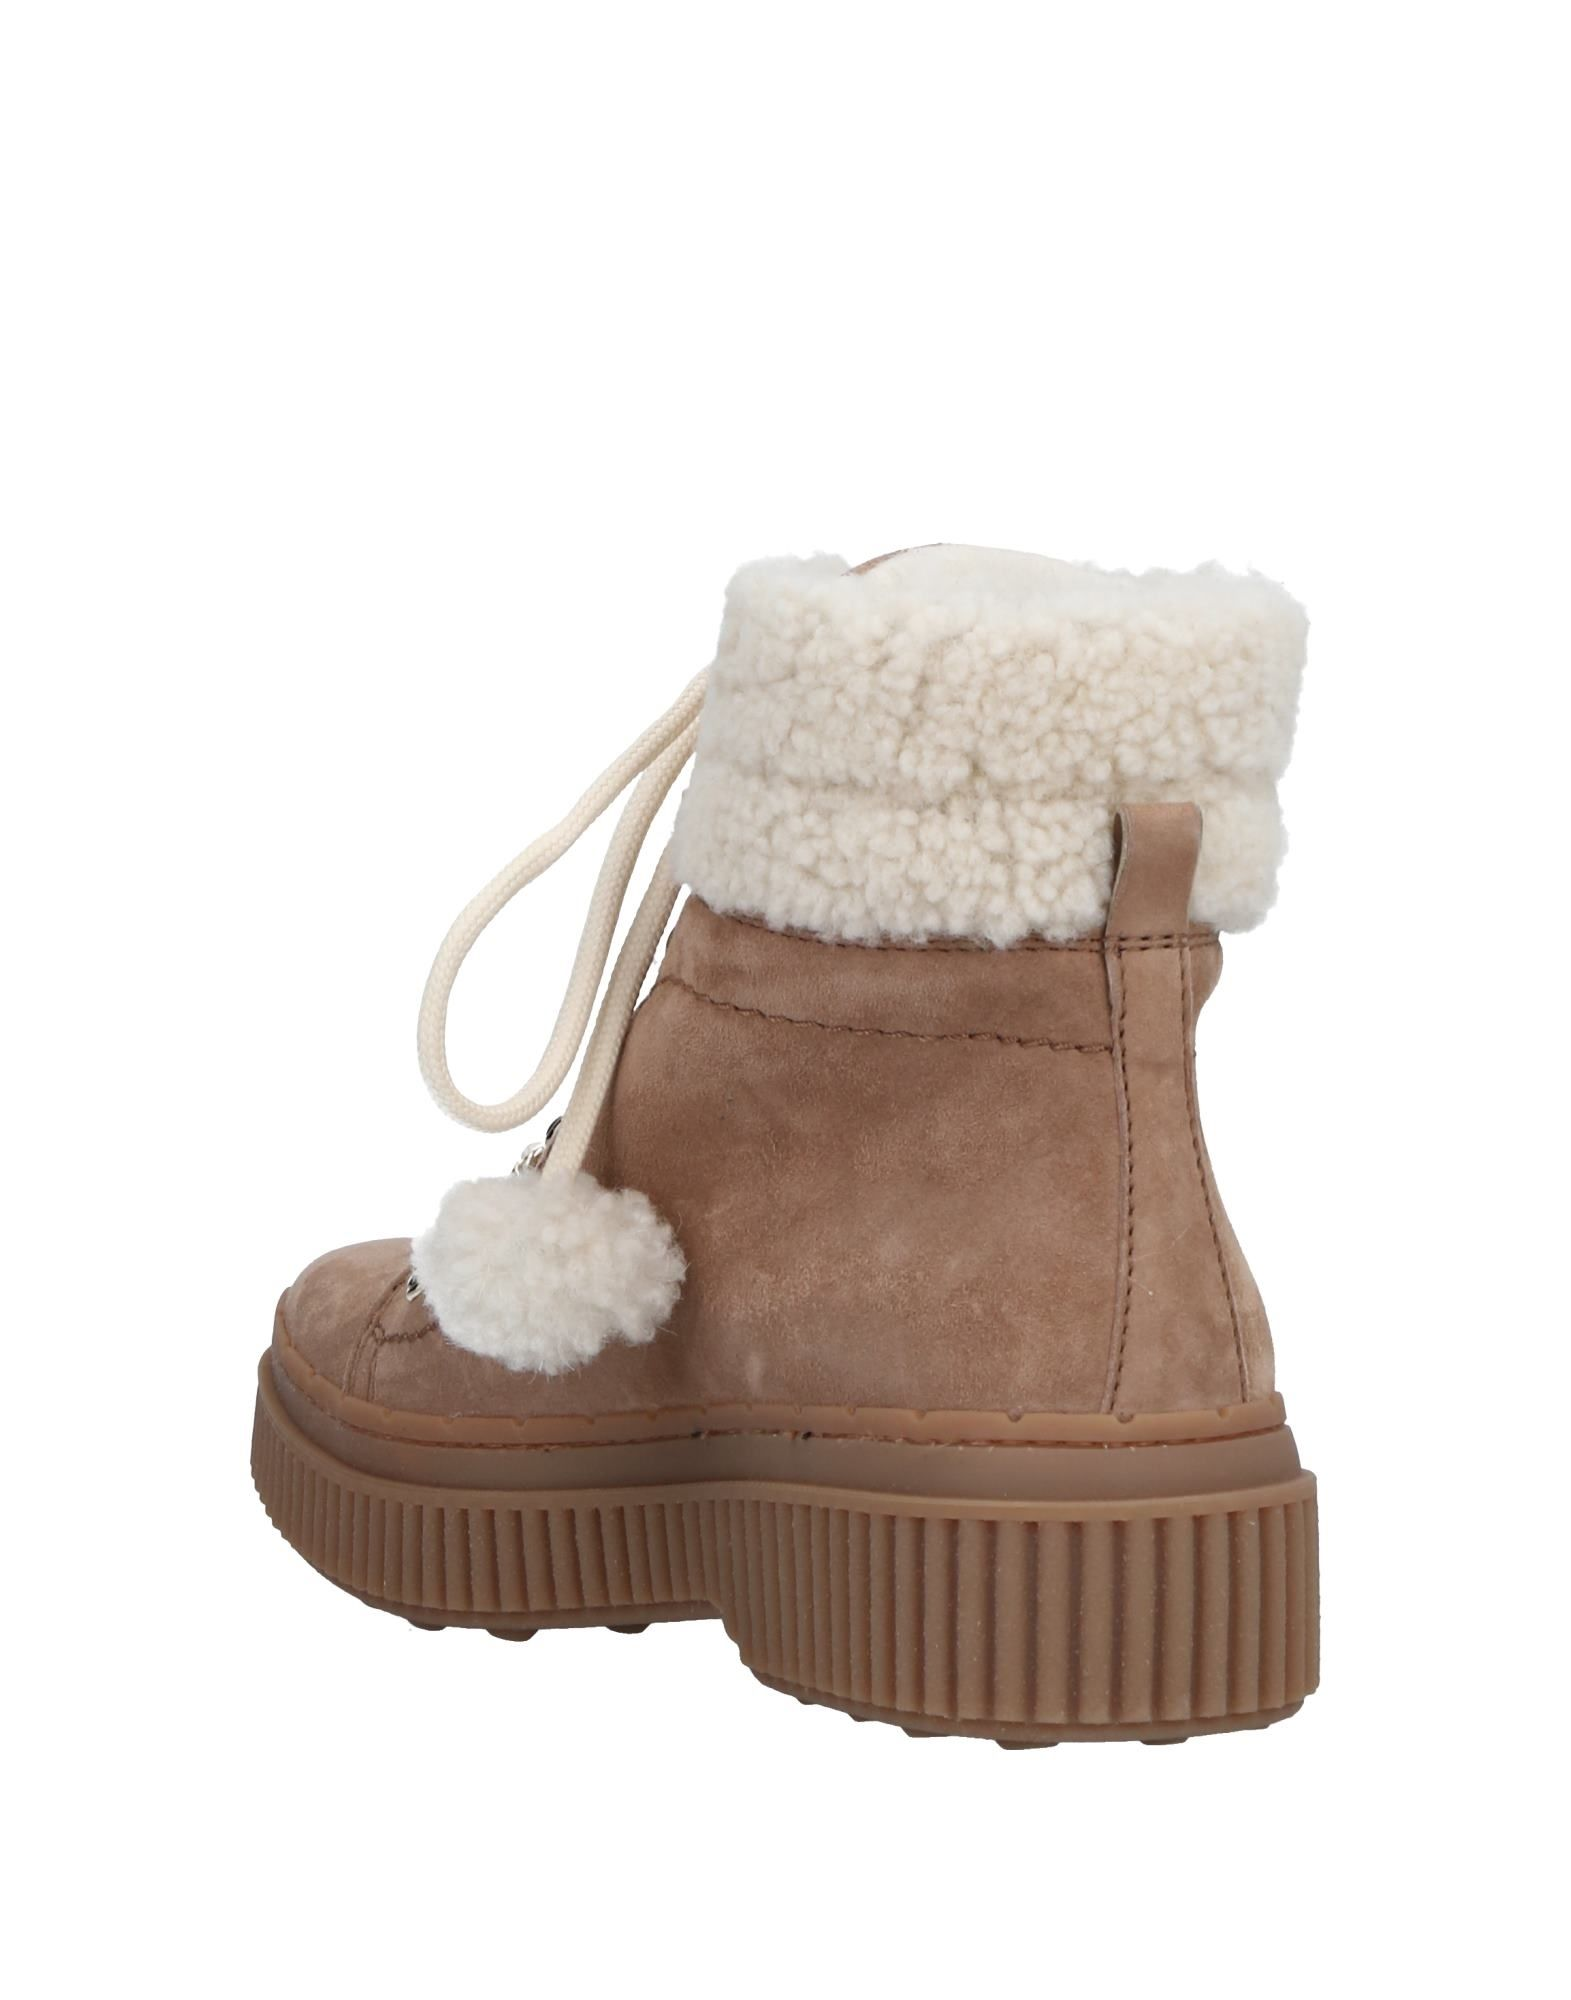 Haltbare Mode billige Schuhe Tod's Stiefelette Damen  11542853LE Heiße Schuhe